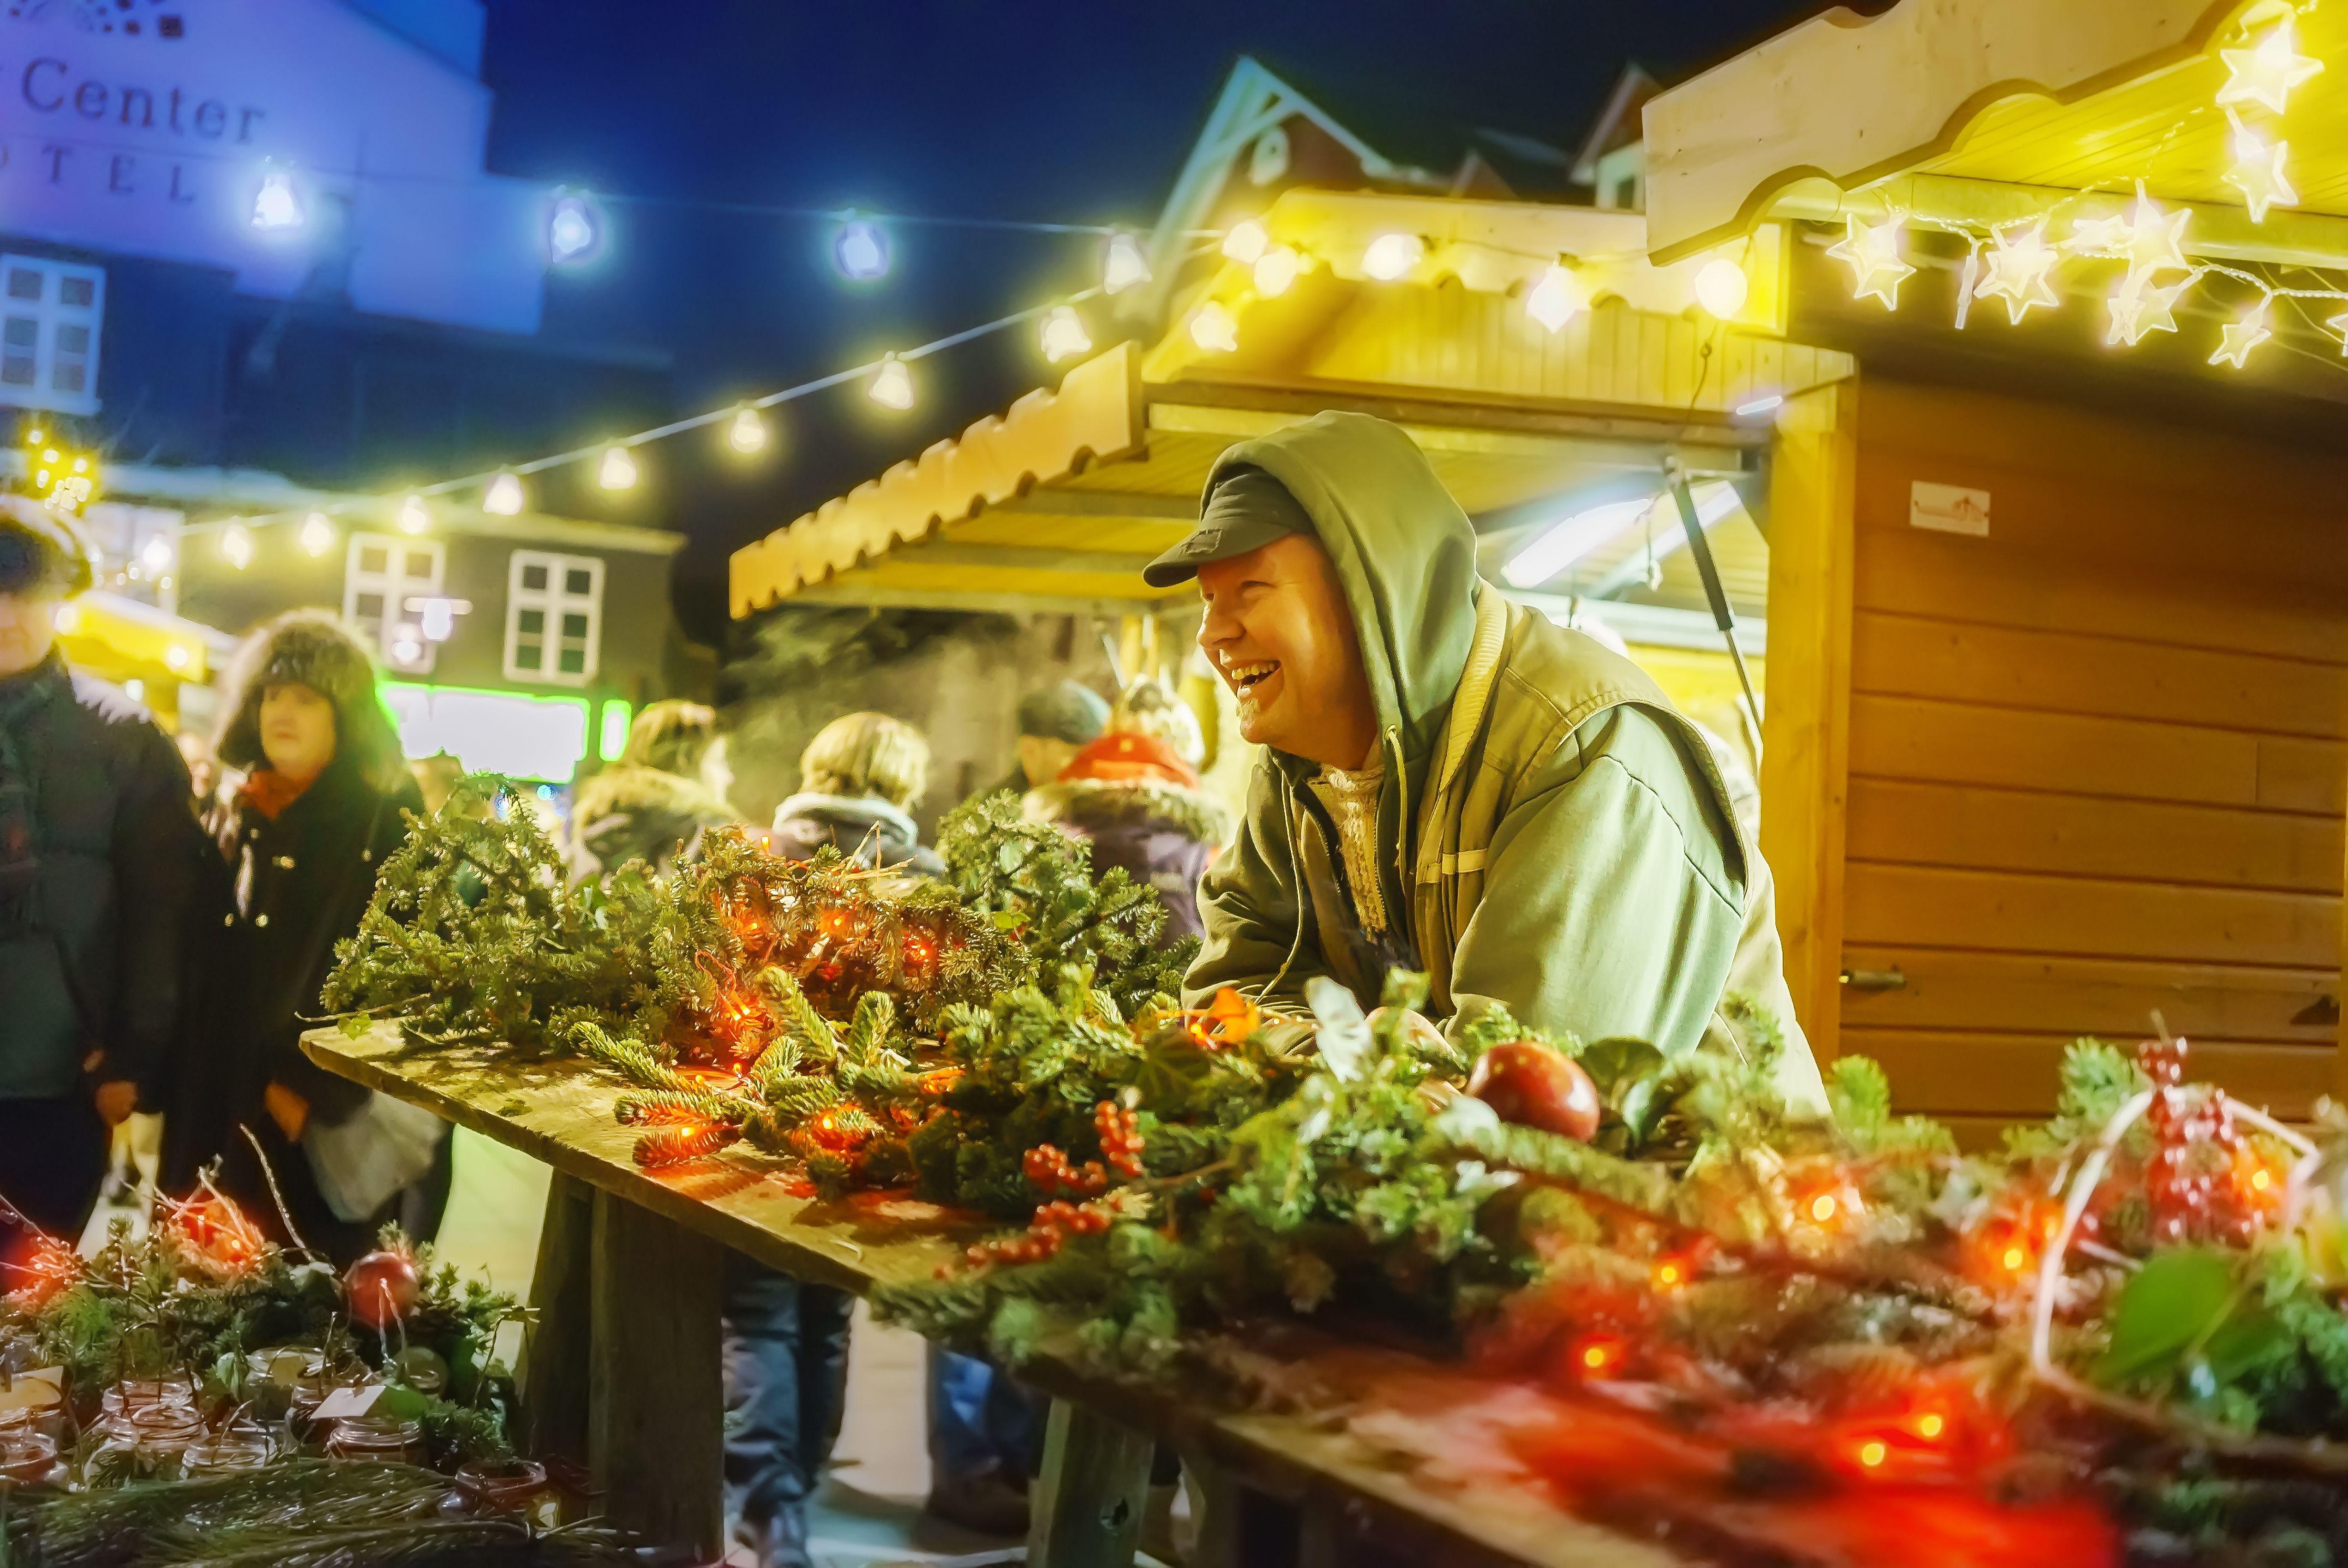 Vendor selling christmas wreaths, Reykjavik, Iceland